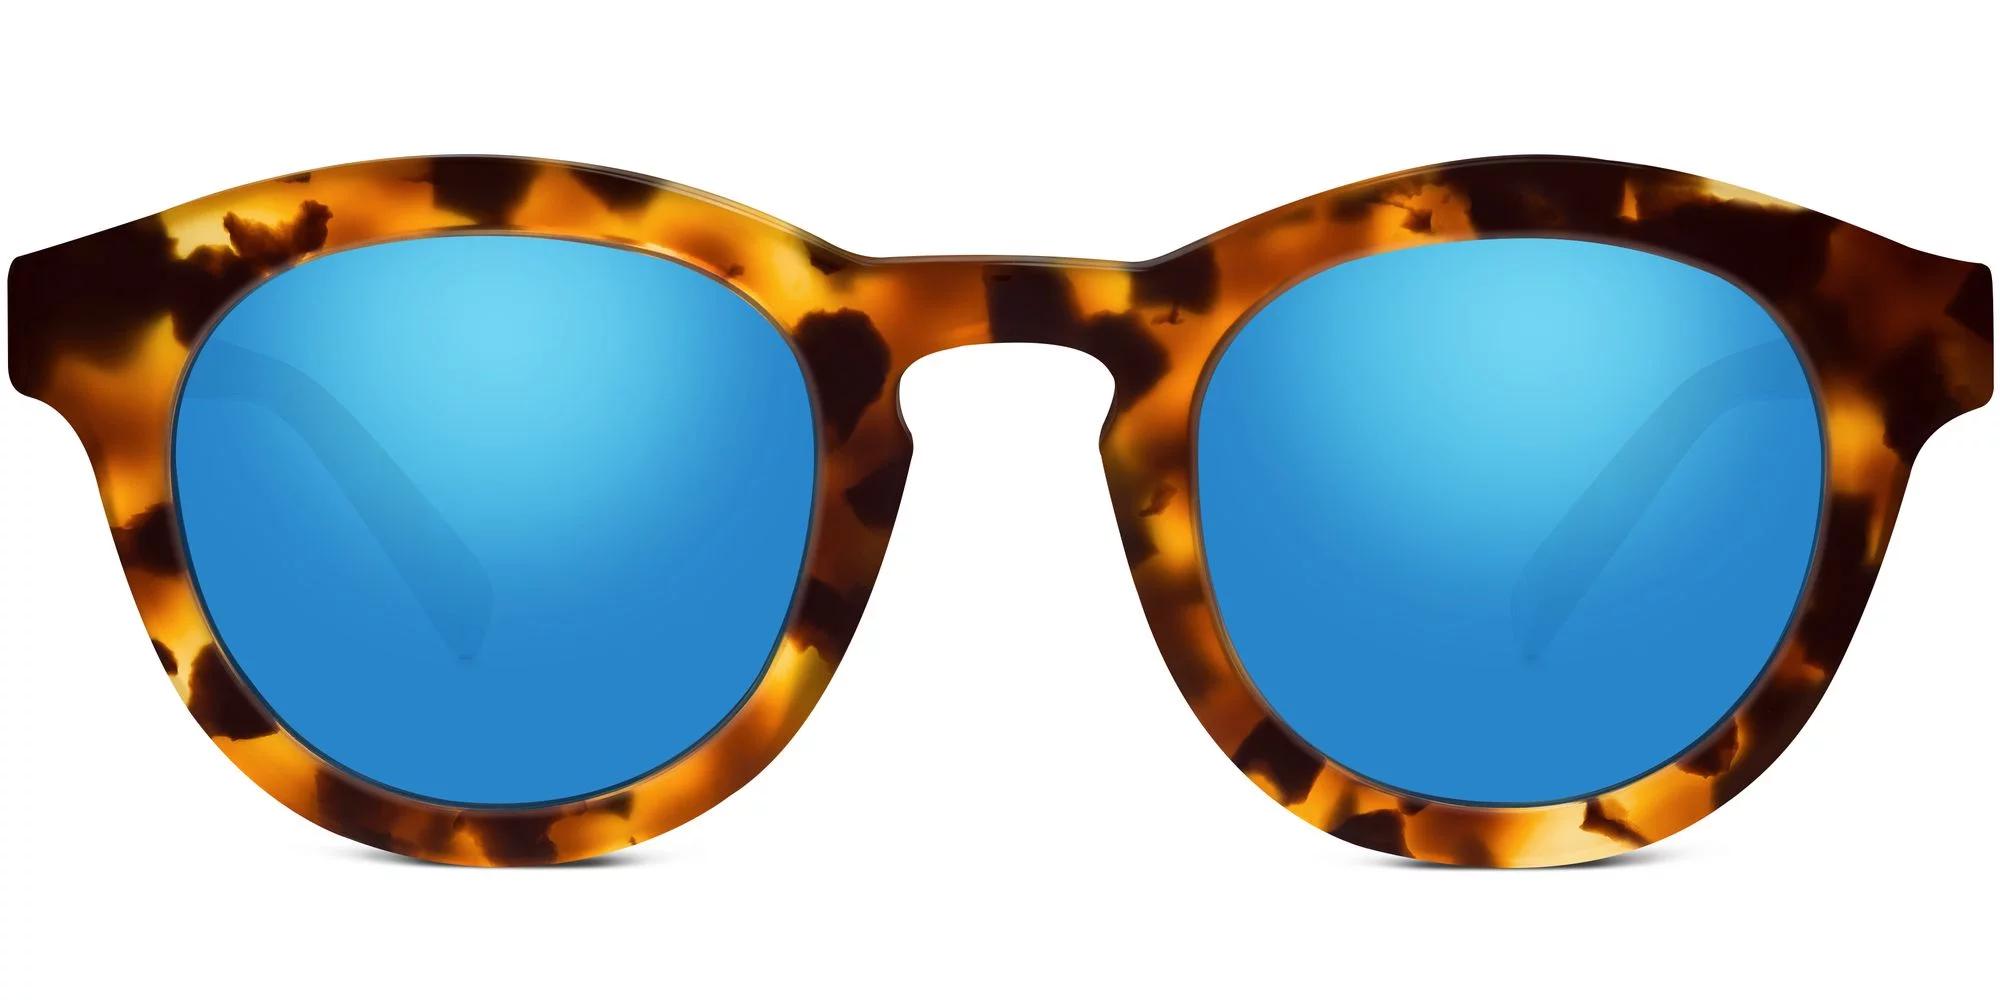 Cheap Sunglasses - Affordable Stylish